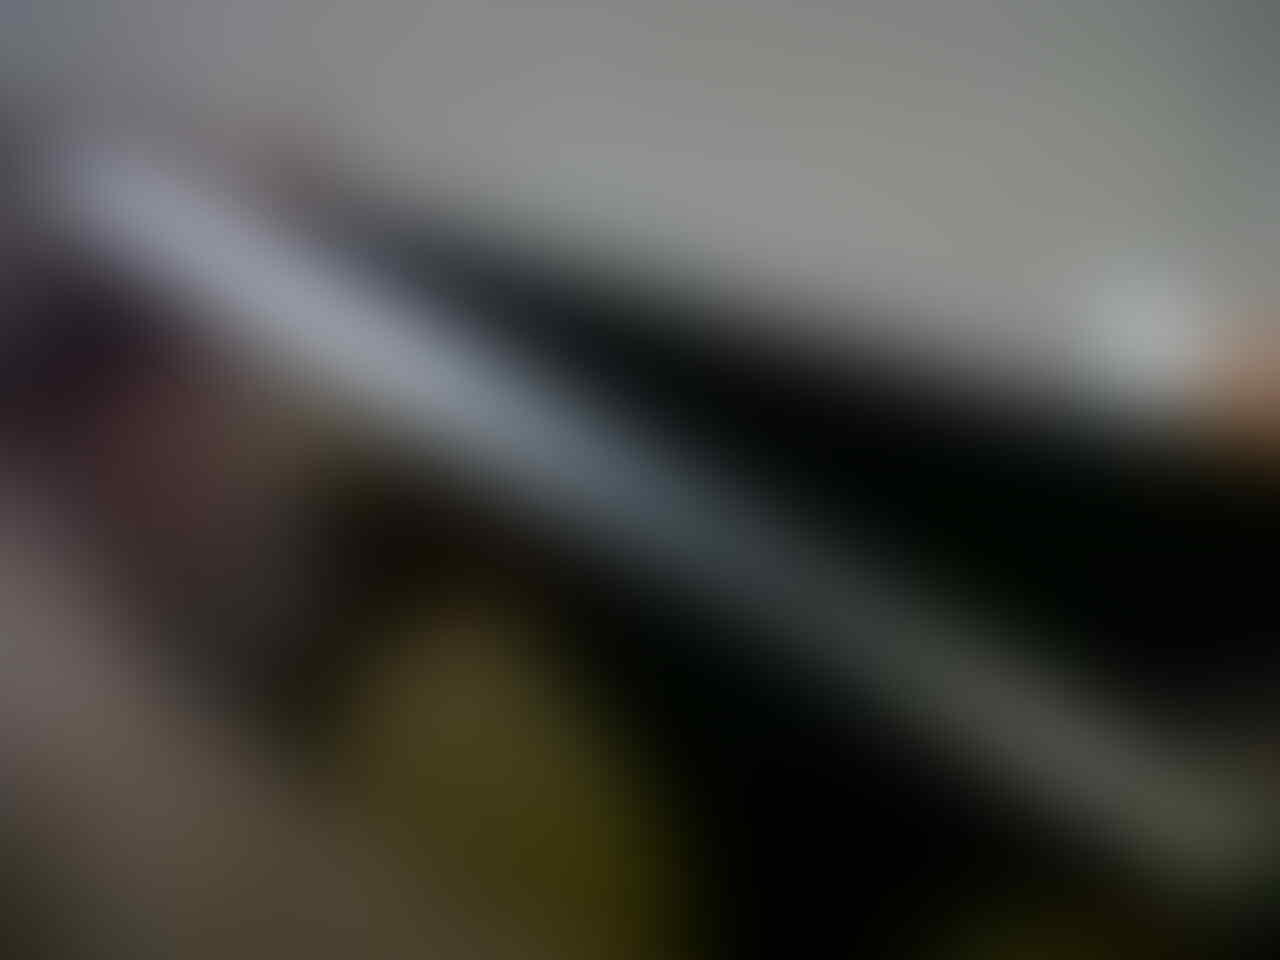 DIJUAL iPHONE 4 16GB MULUS FULLSET LIKE NEW BEKASI